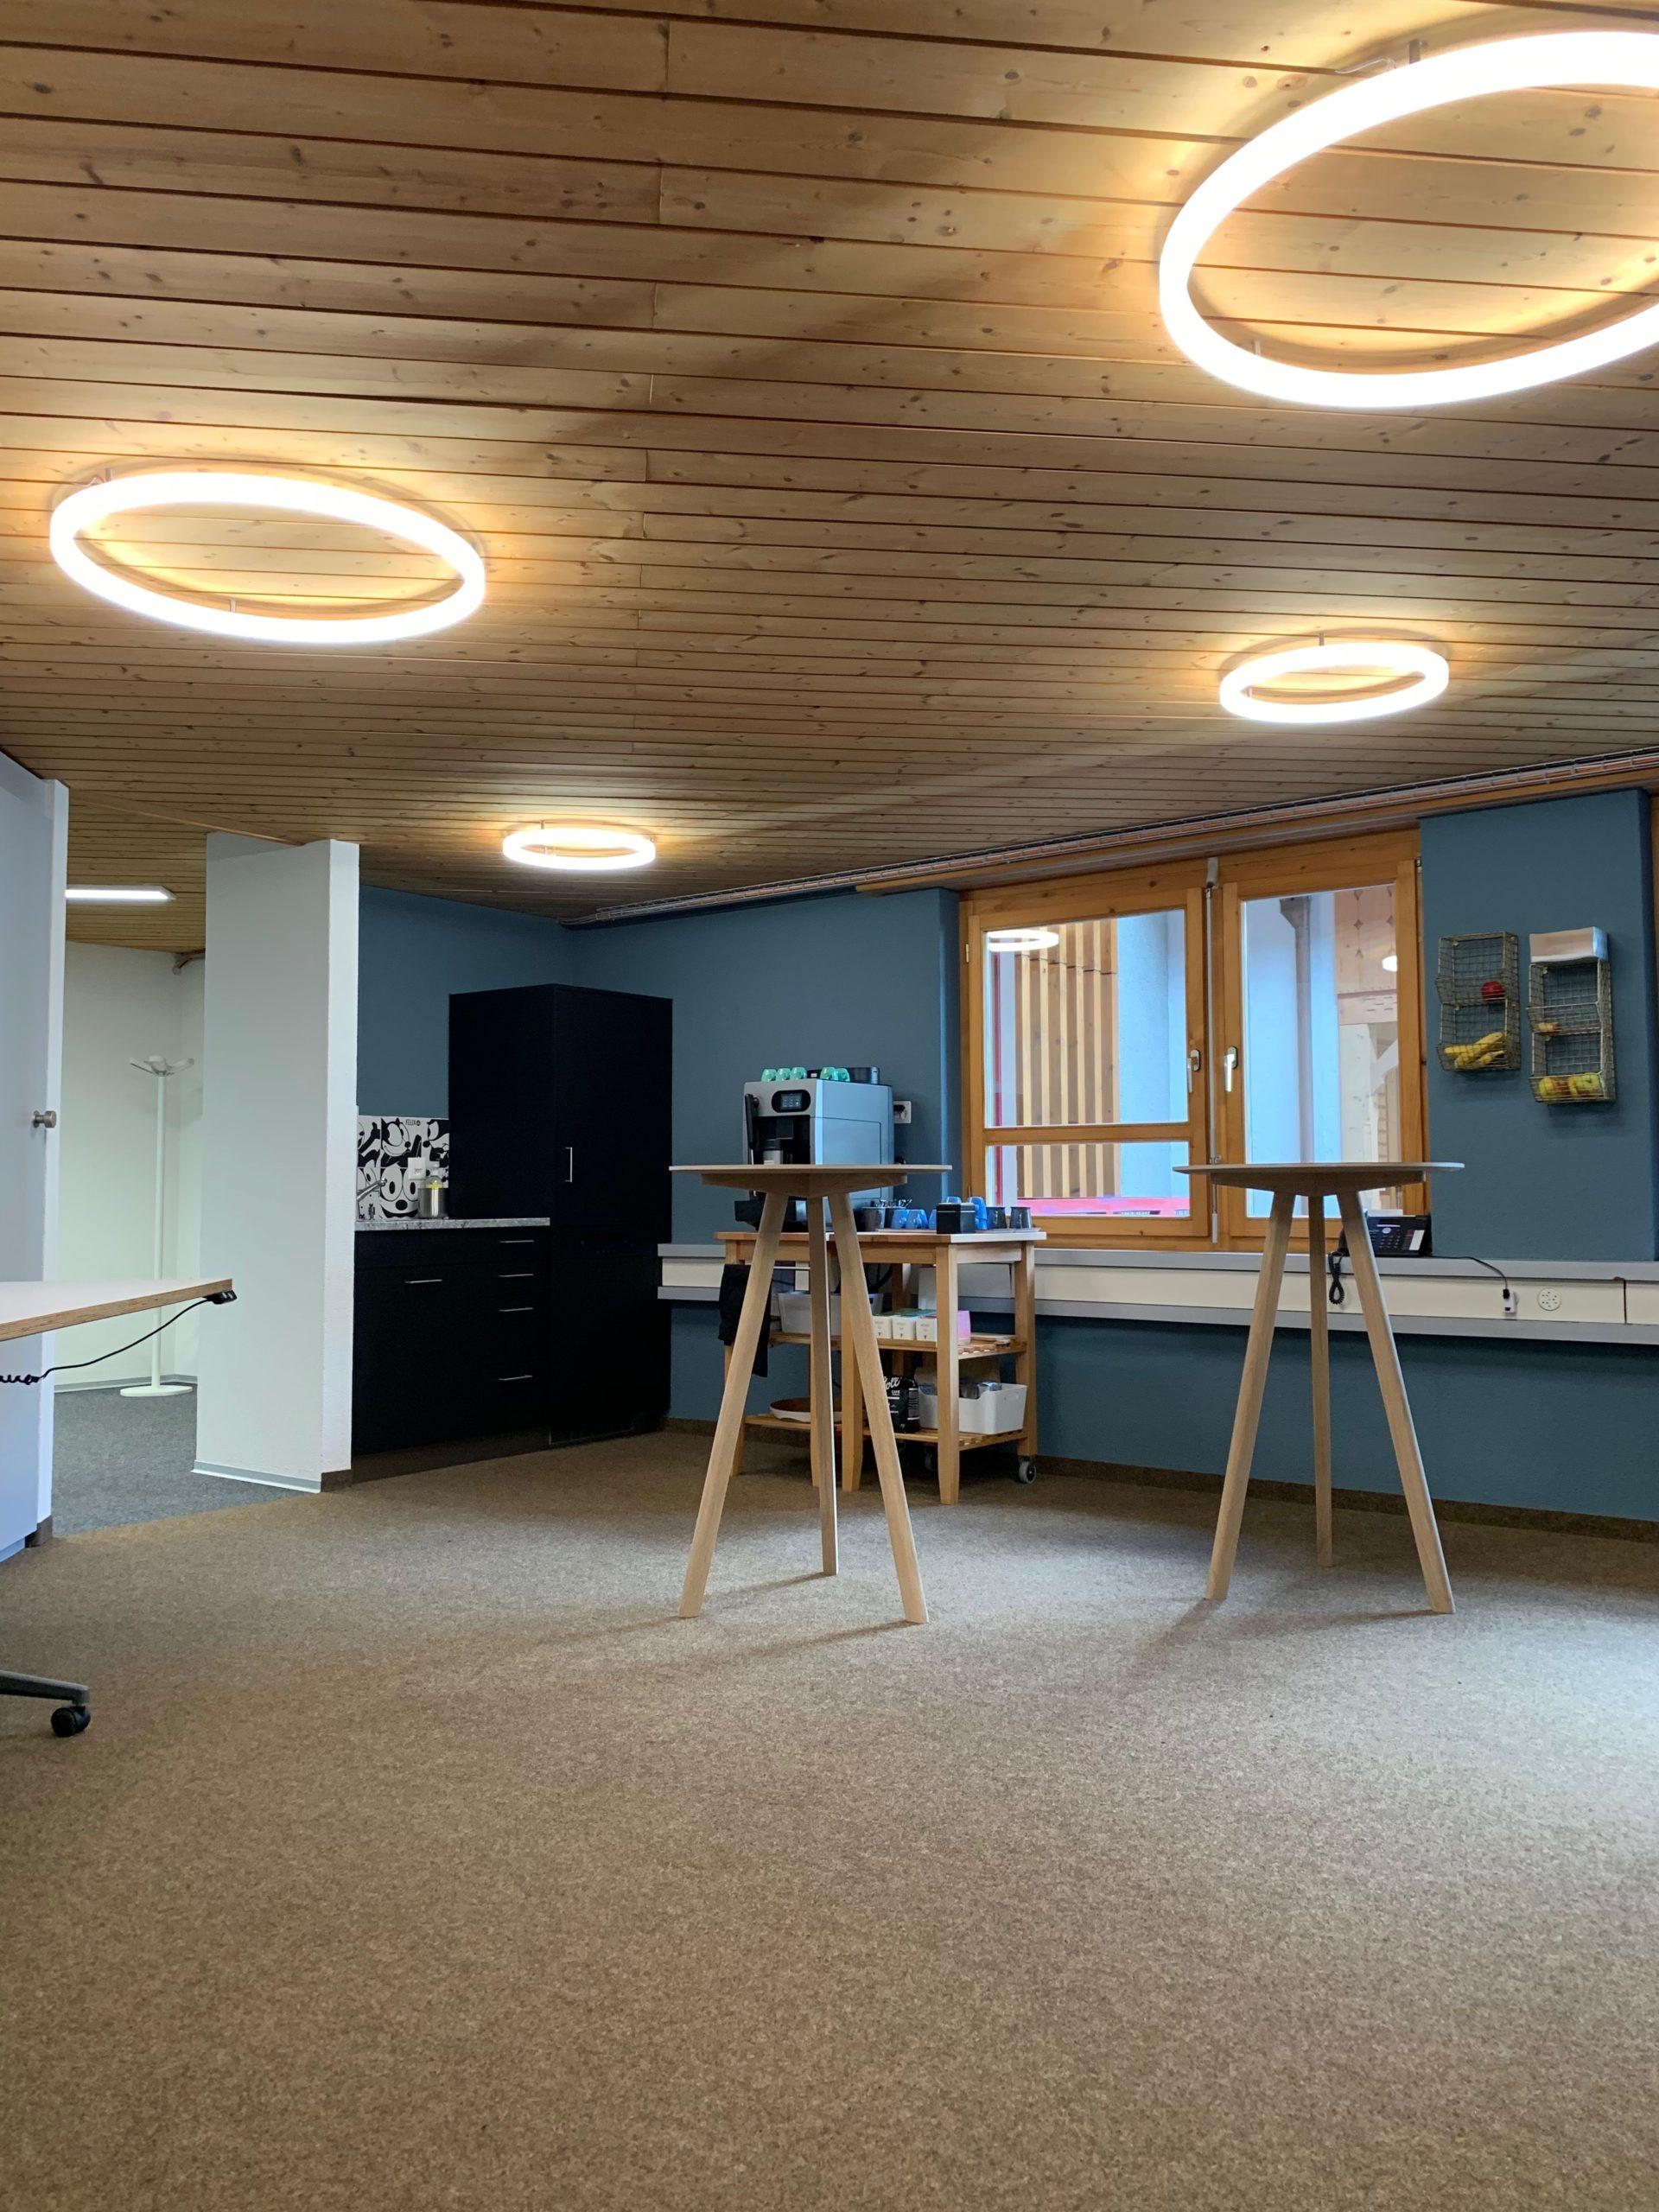 LED Ringleuchte TheO Flotron AG Aufenthaltsraum